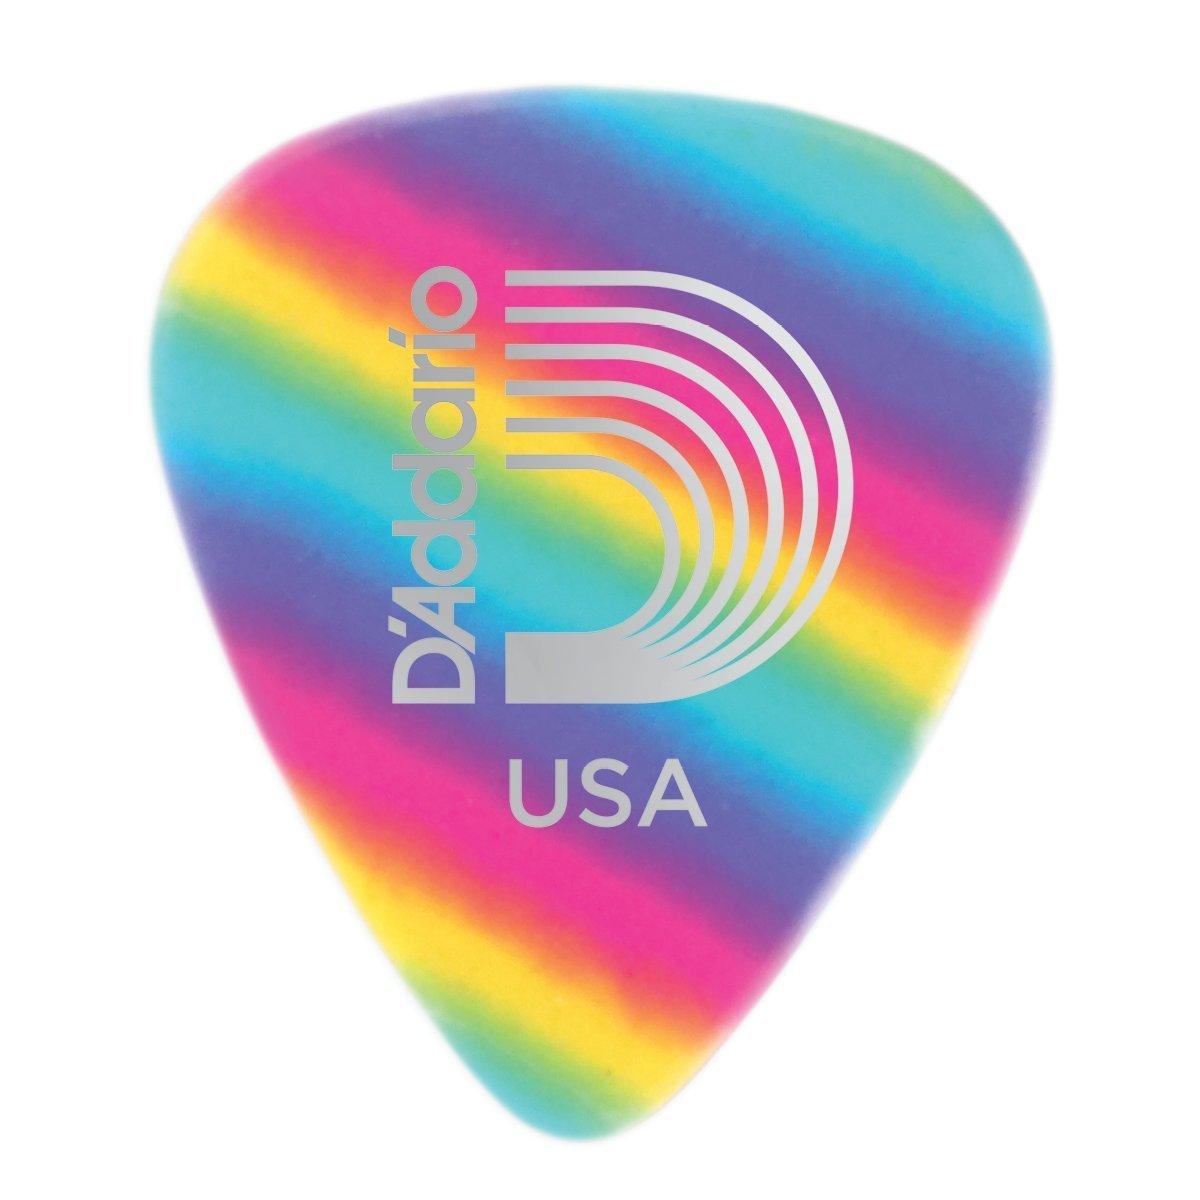 D'Addario Rainbow Celluloid Guitar Picks, Medium, 10 Pack